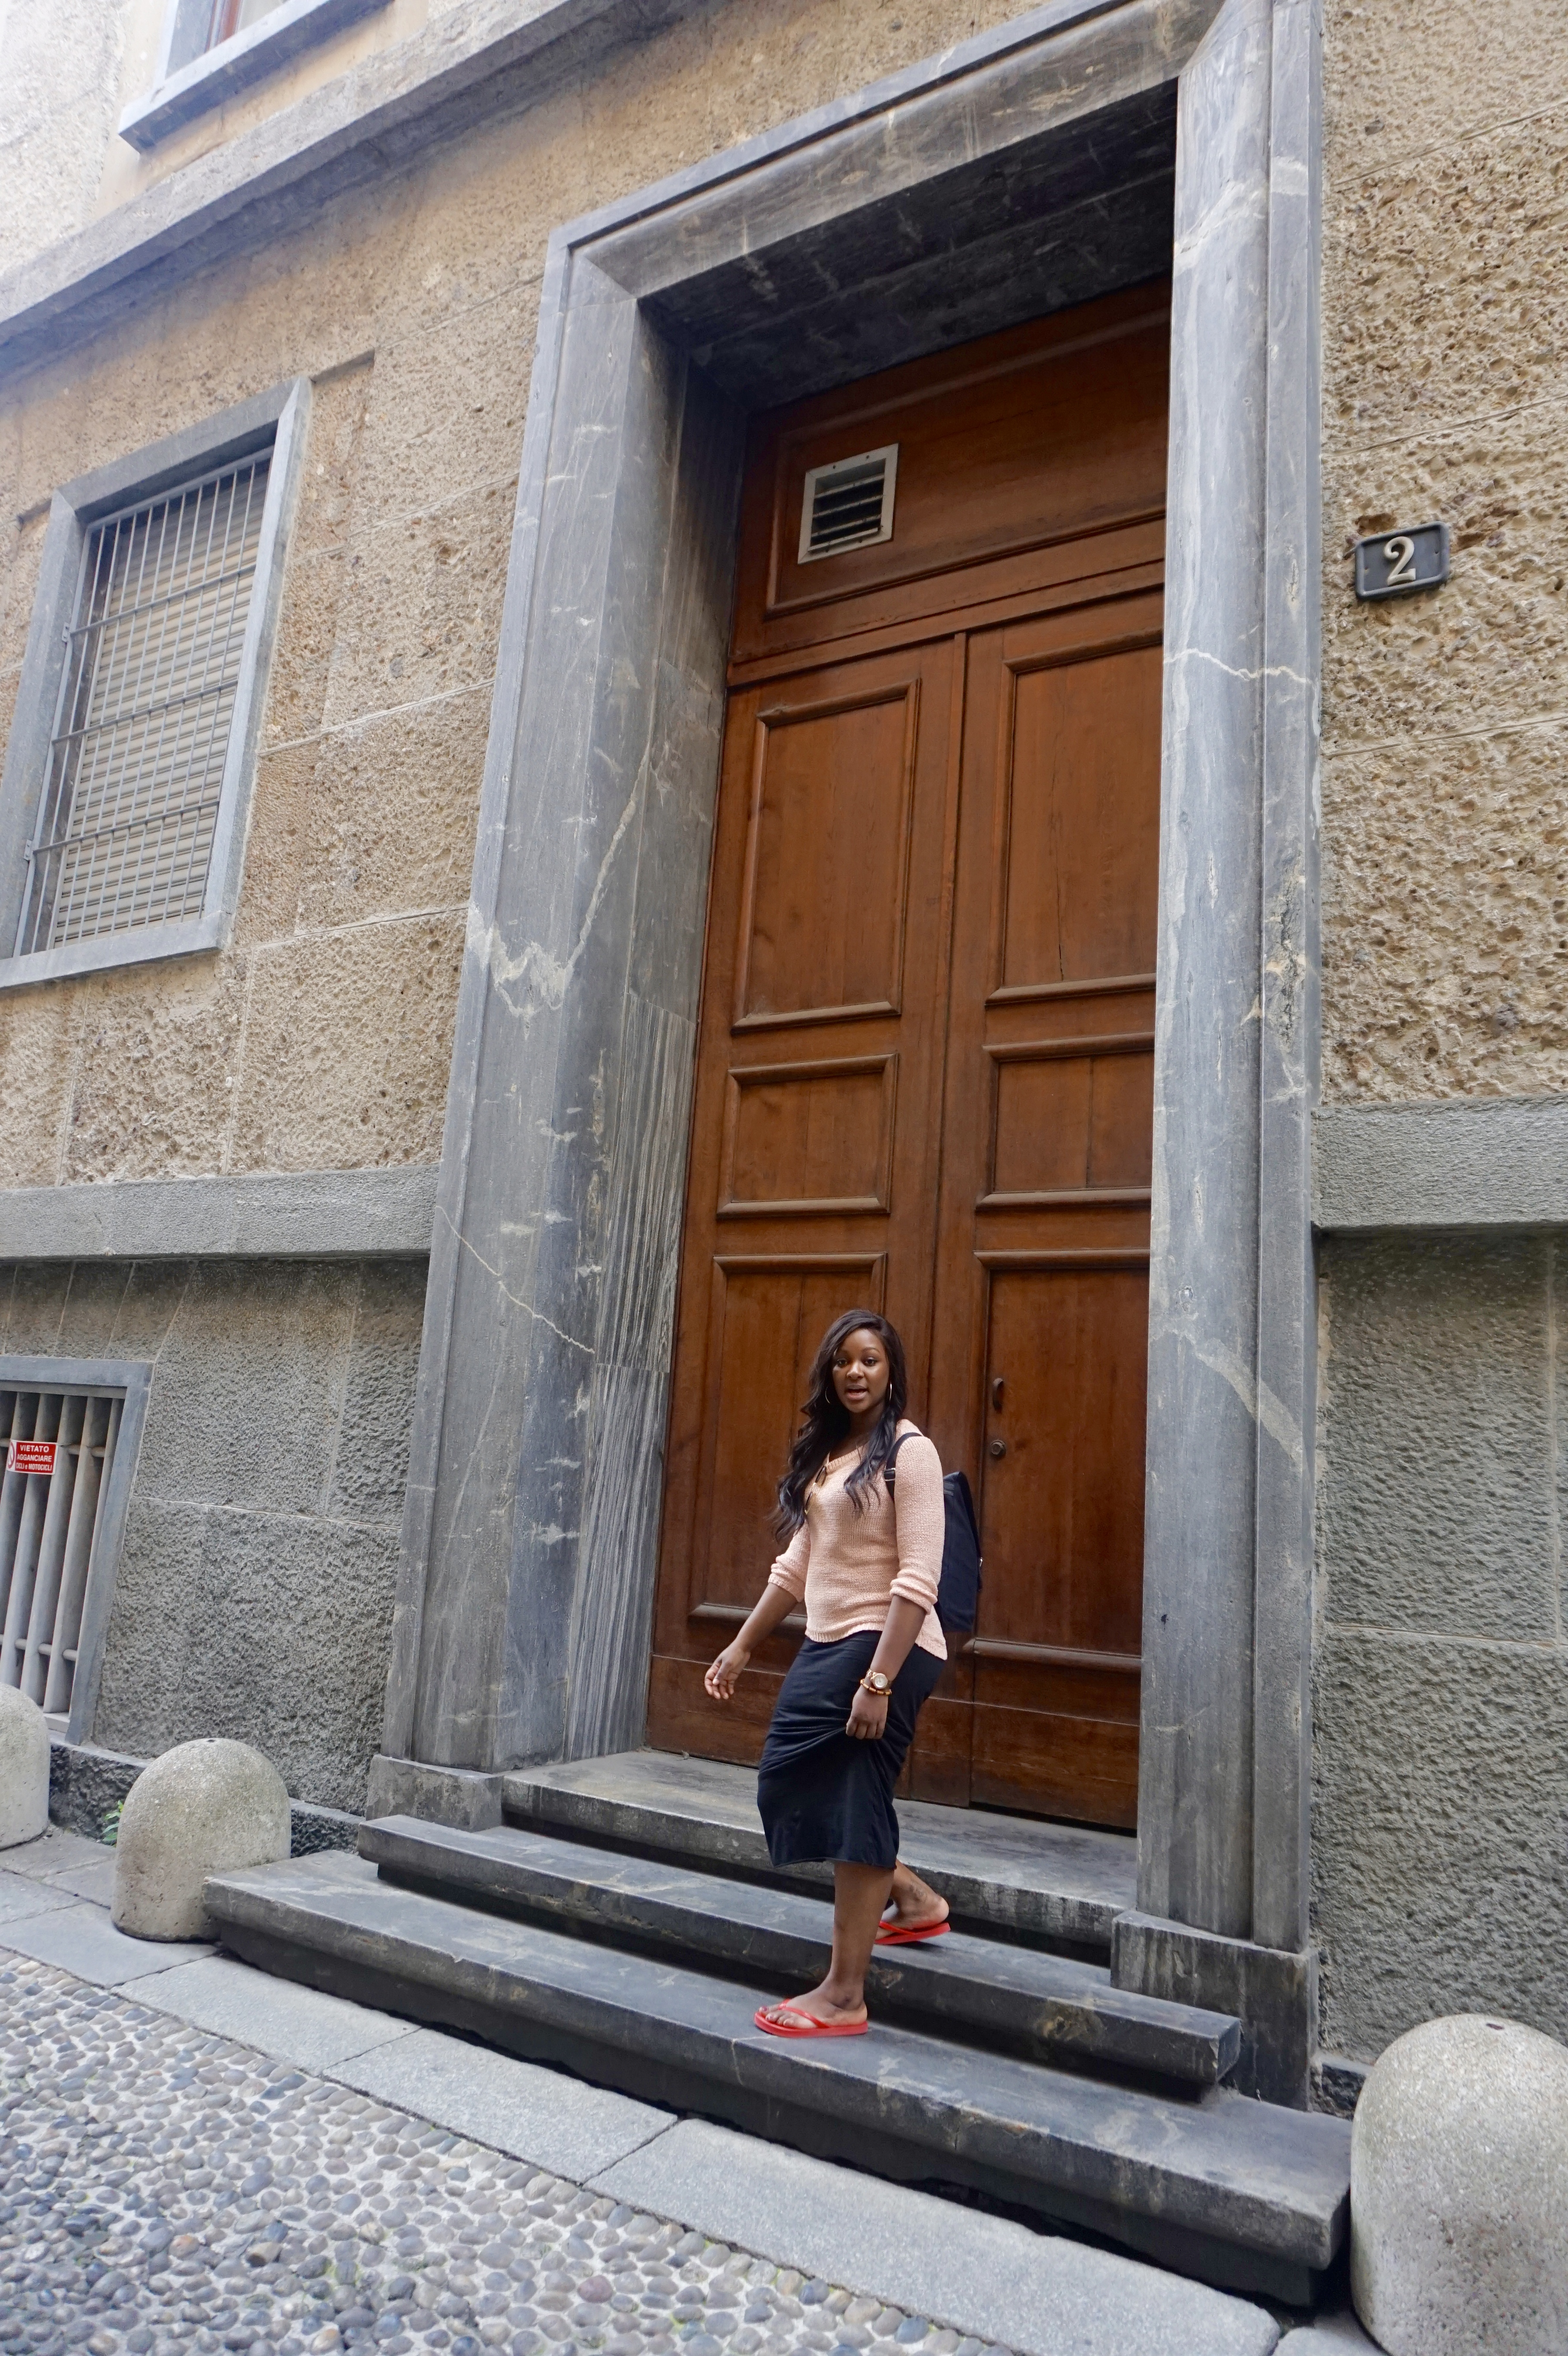 raychel-says-travel-doorway-milan-2017-images